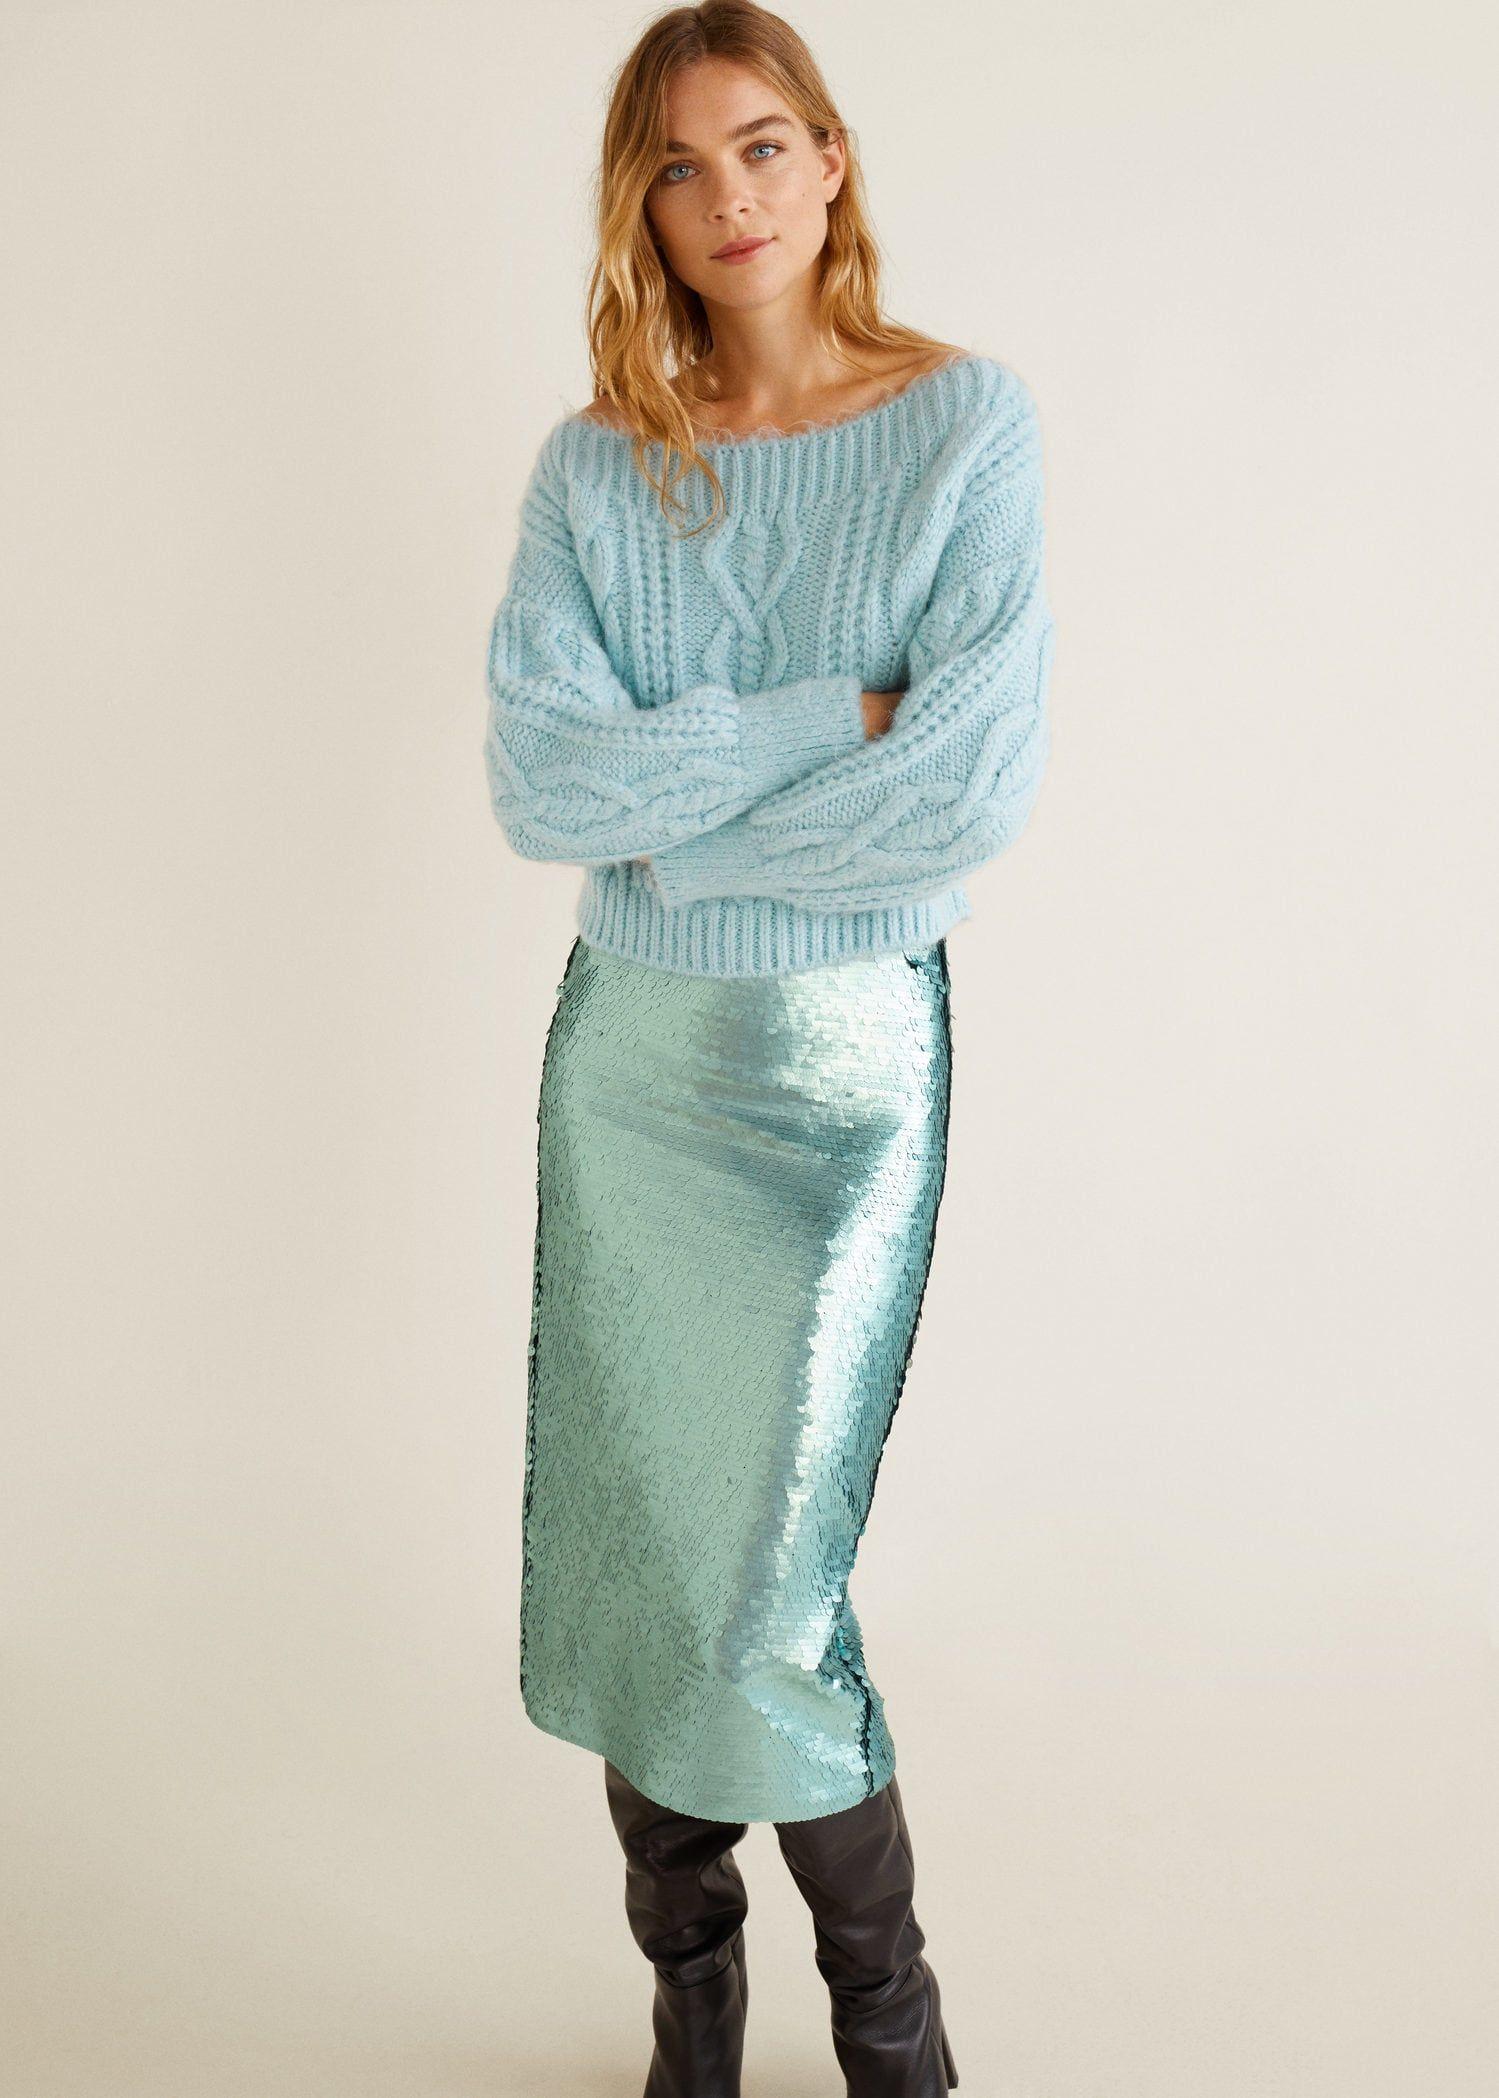 461f55bb09 Sequin skirt - Women